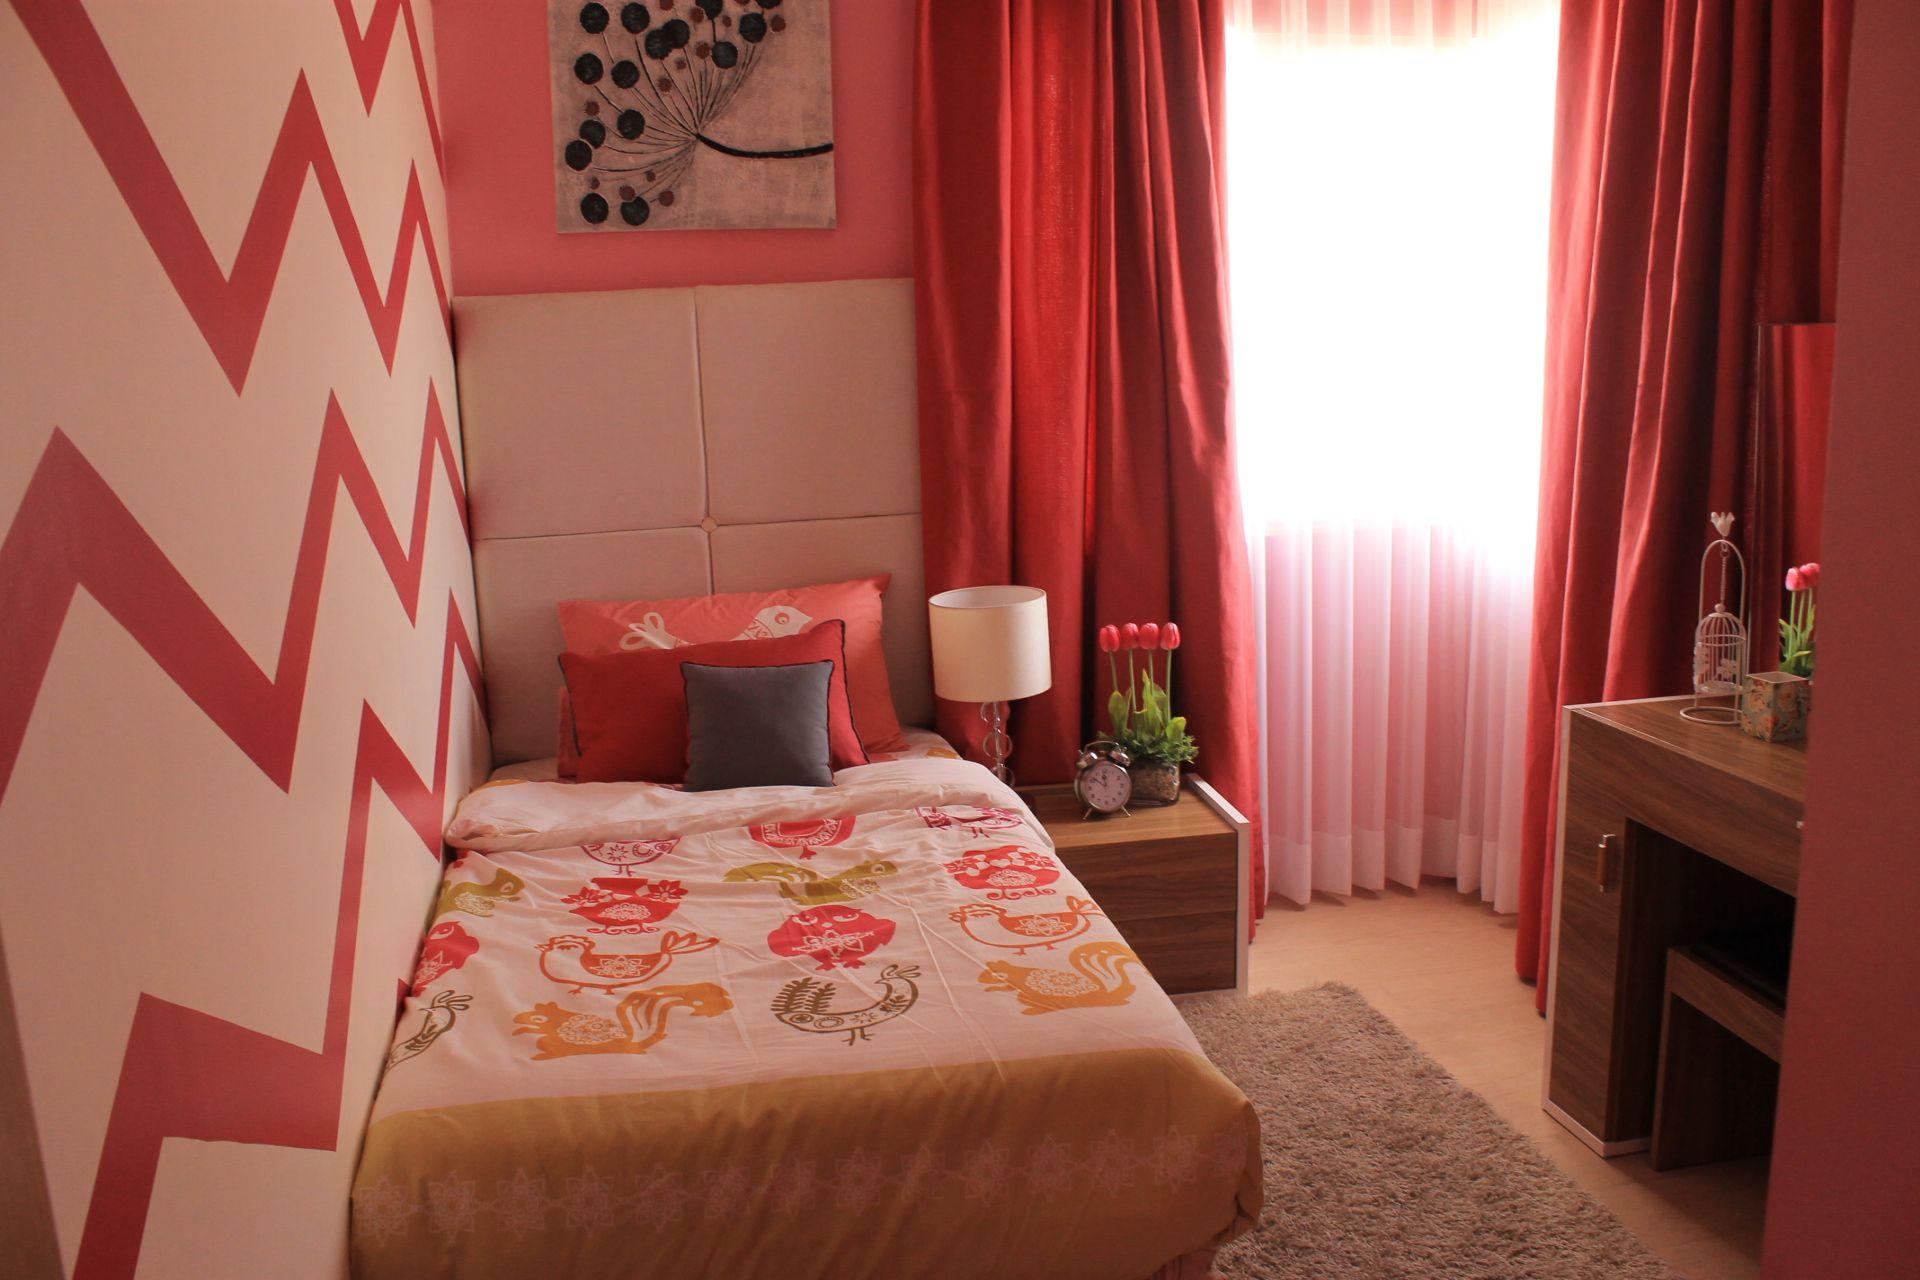 mansfield residences cyan bedroom | mansfield residences | pinterest